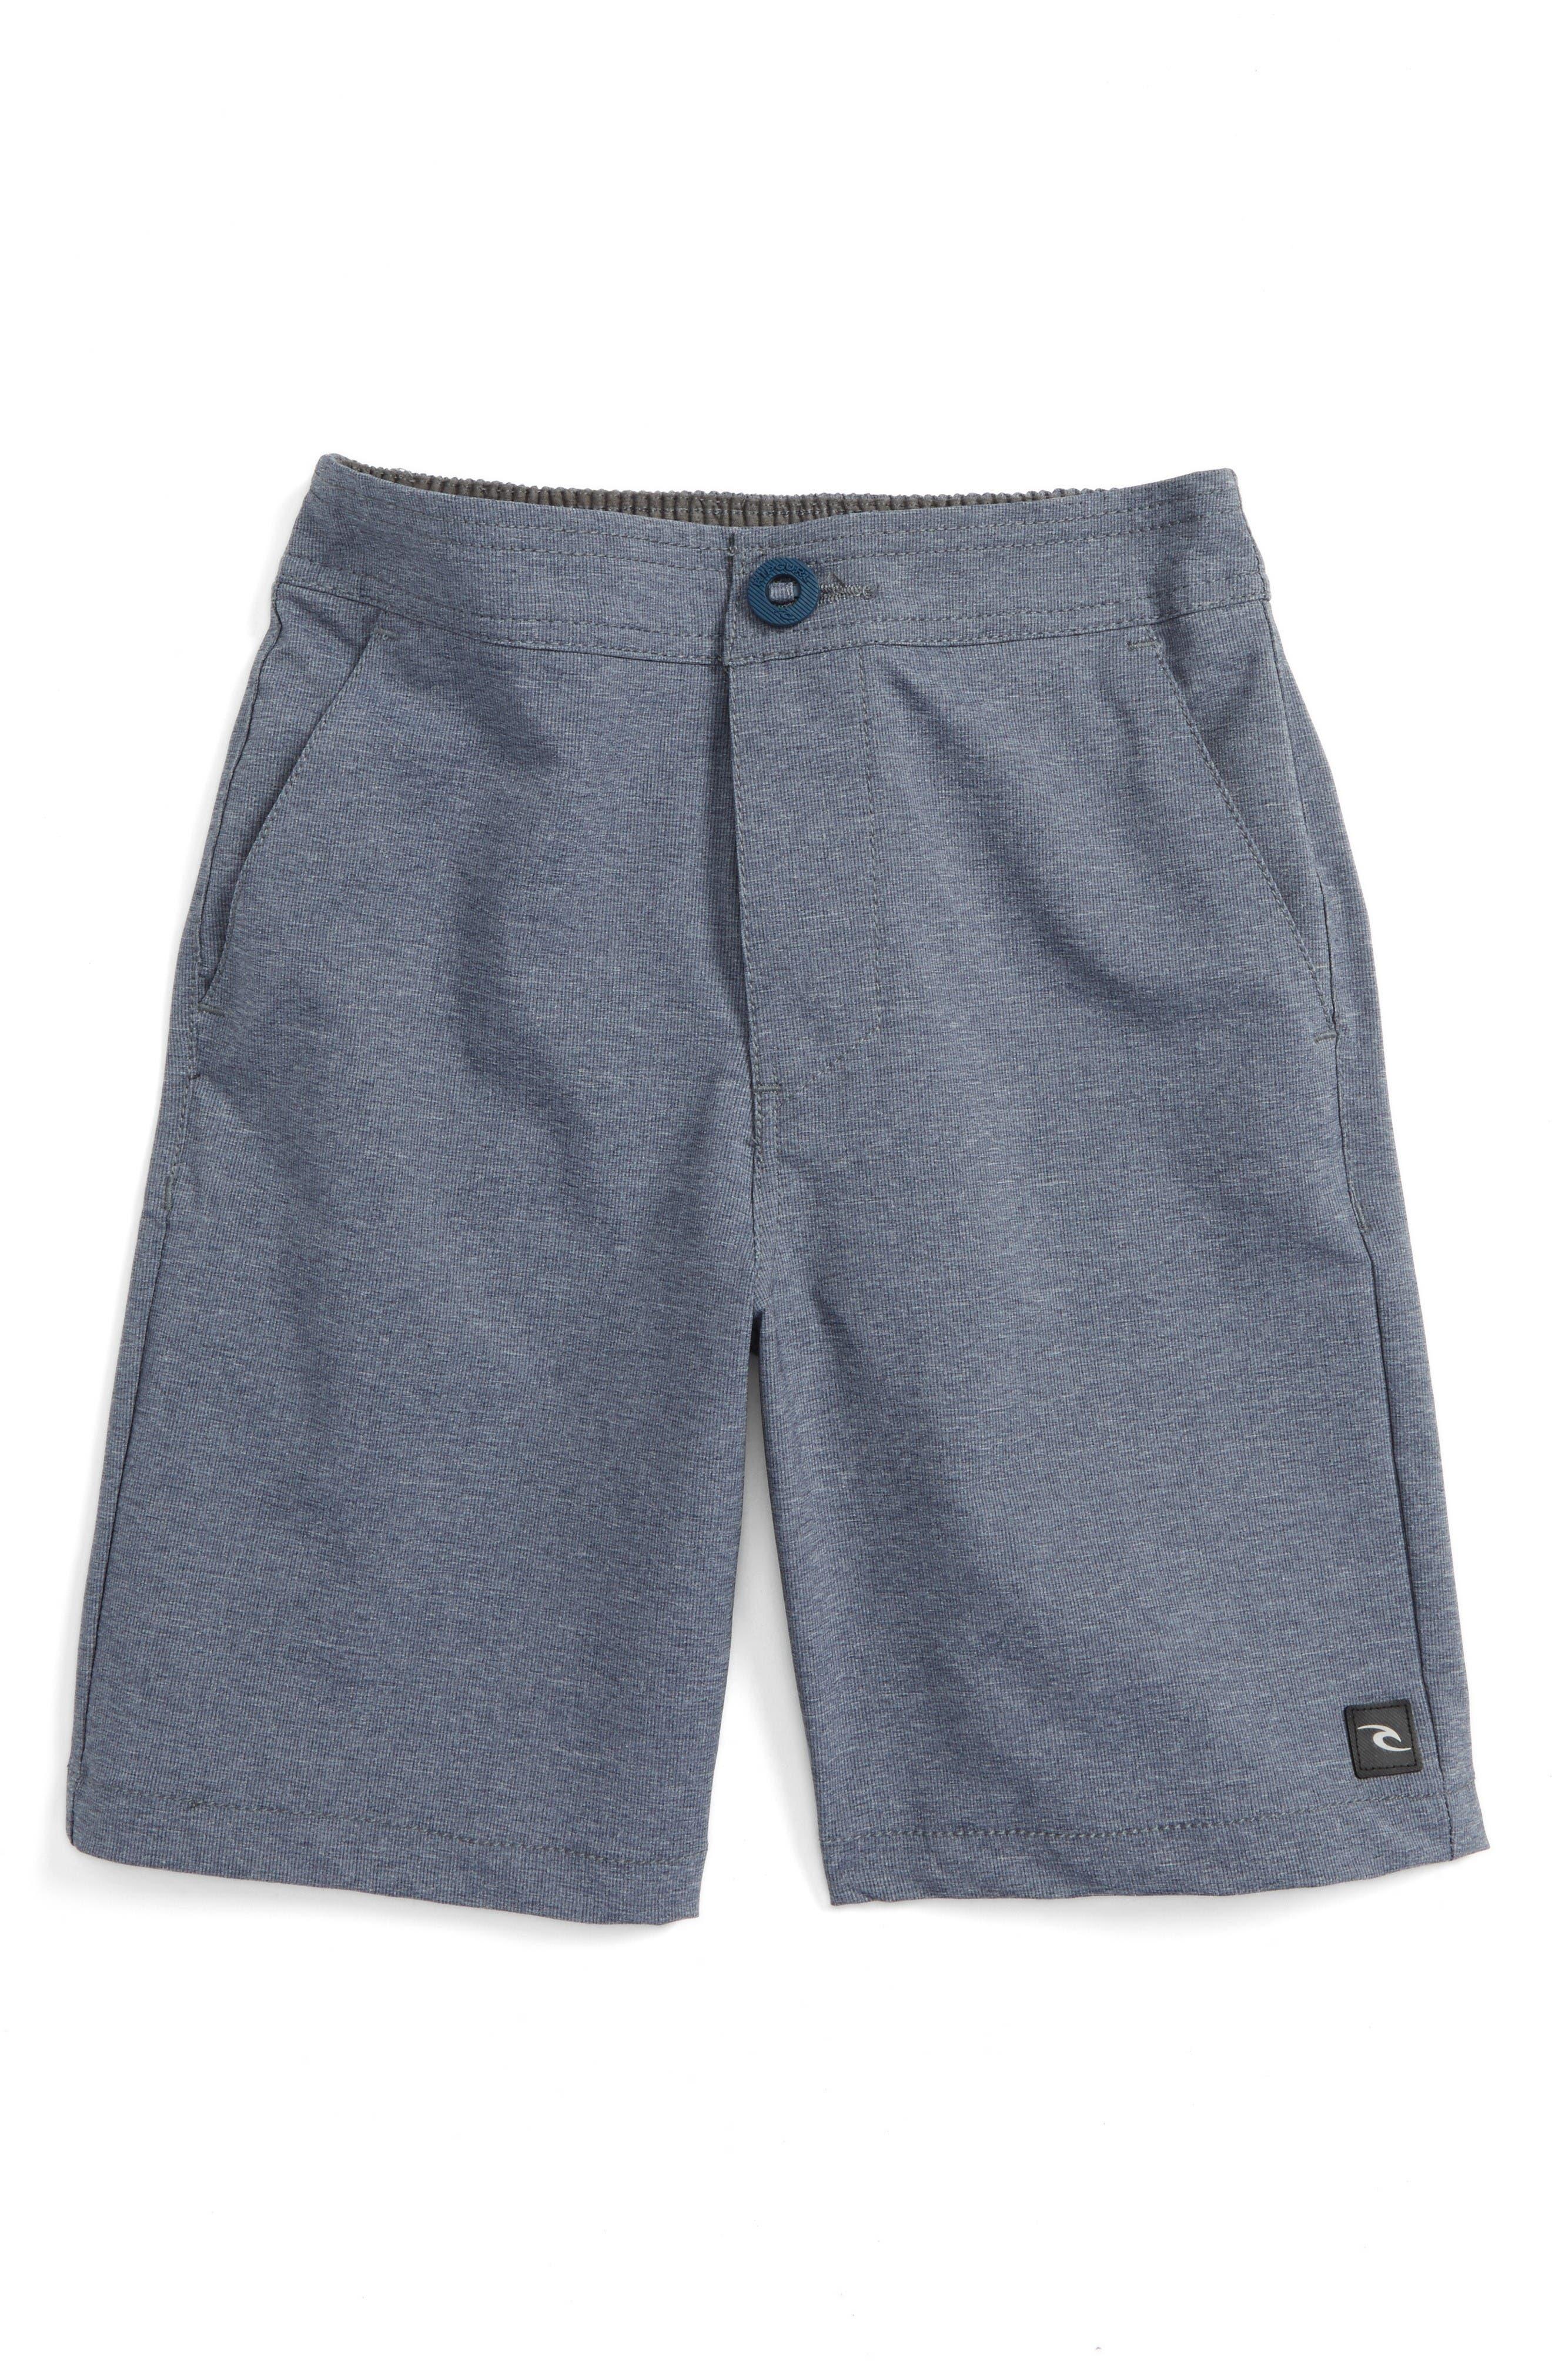 RIP CURL Omaha Hybrid Board Shorts